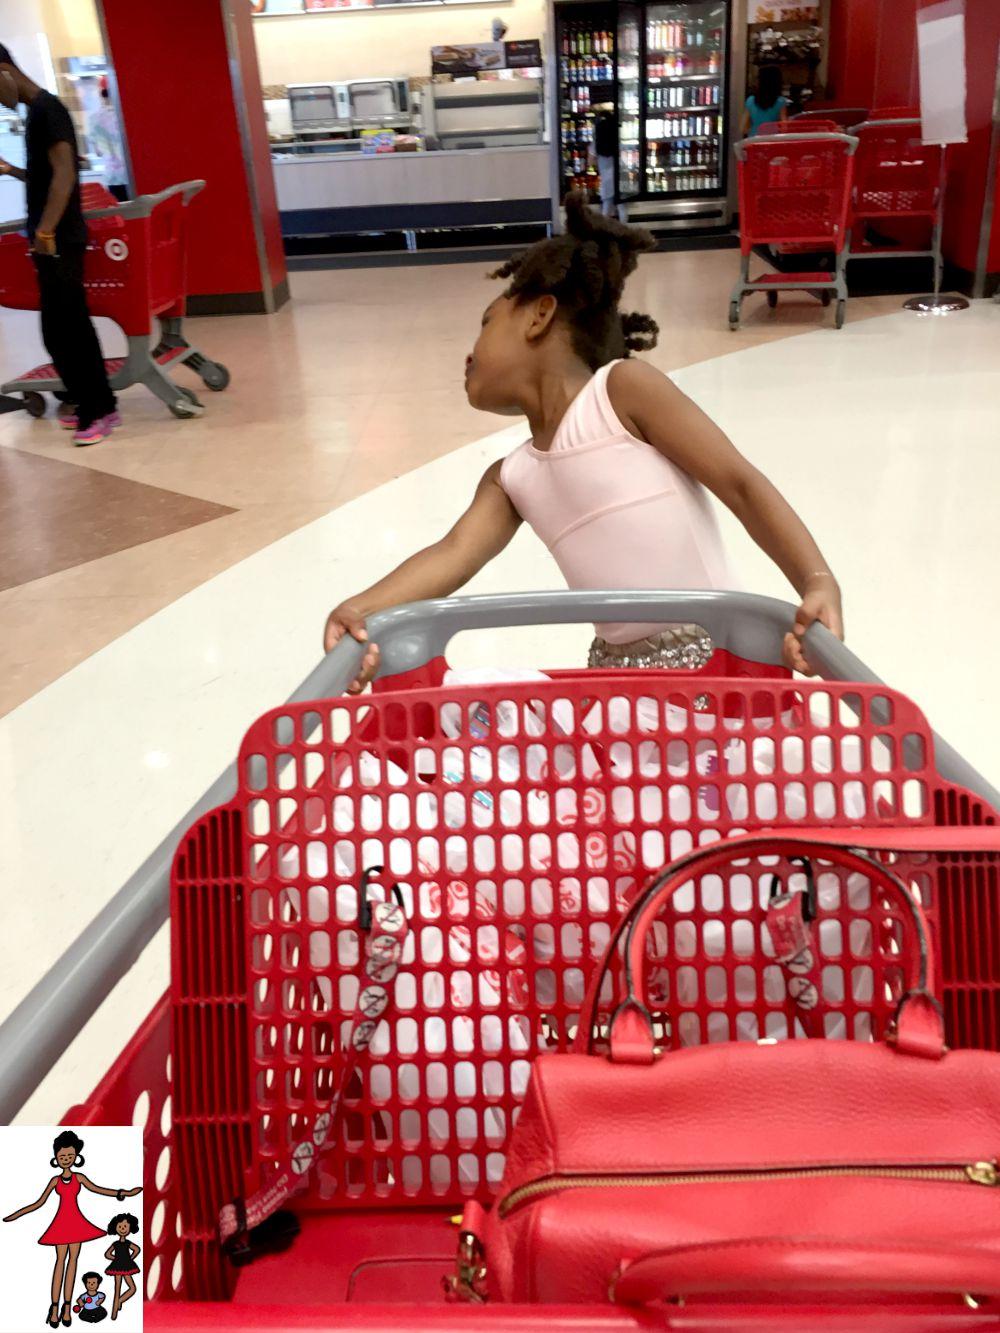 back-to-school-shopping.jpg